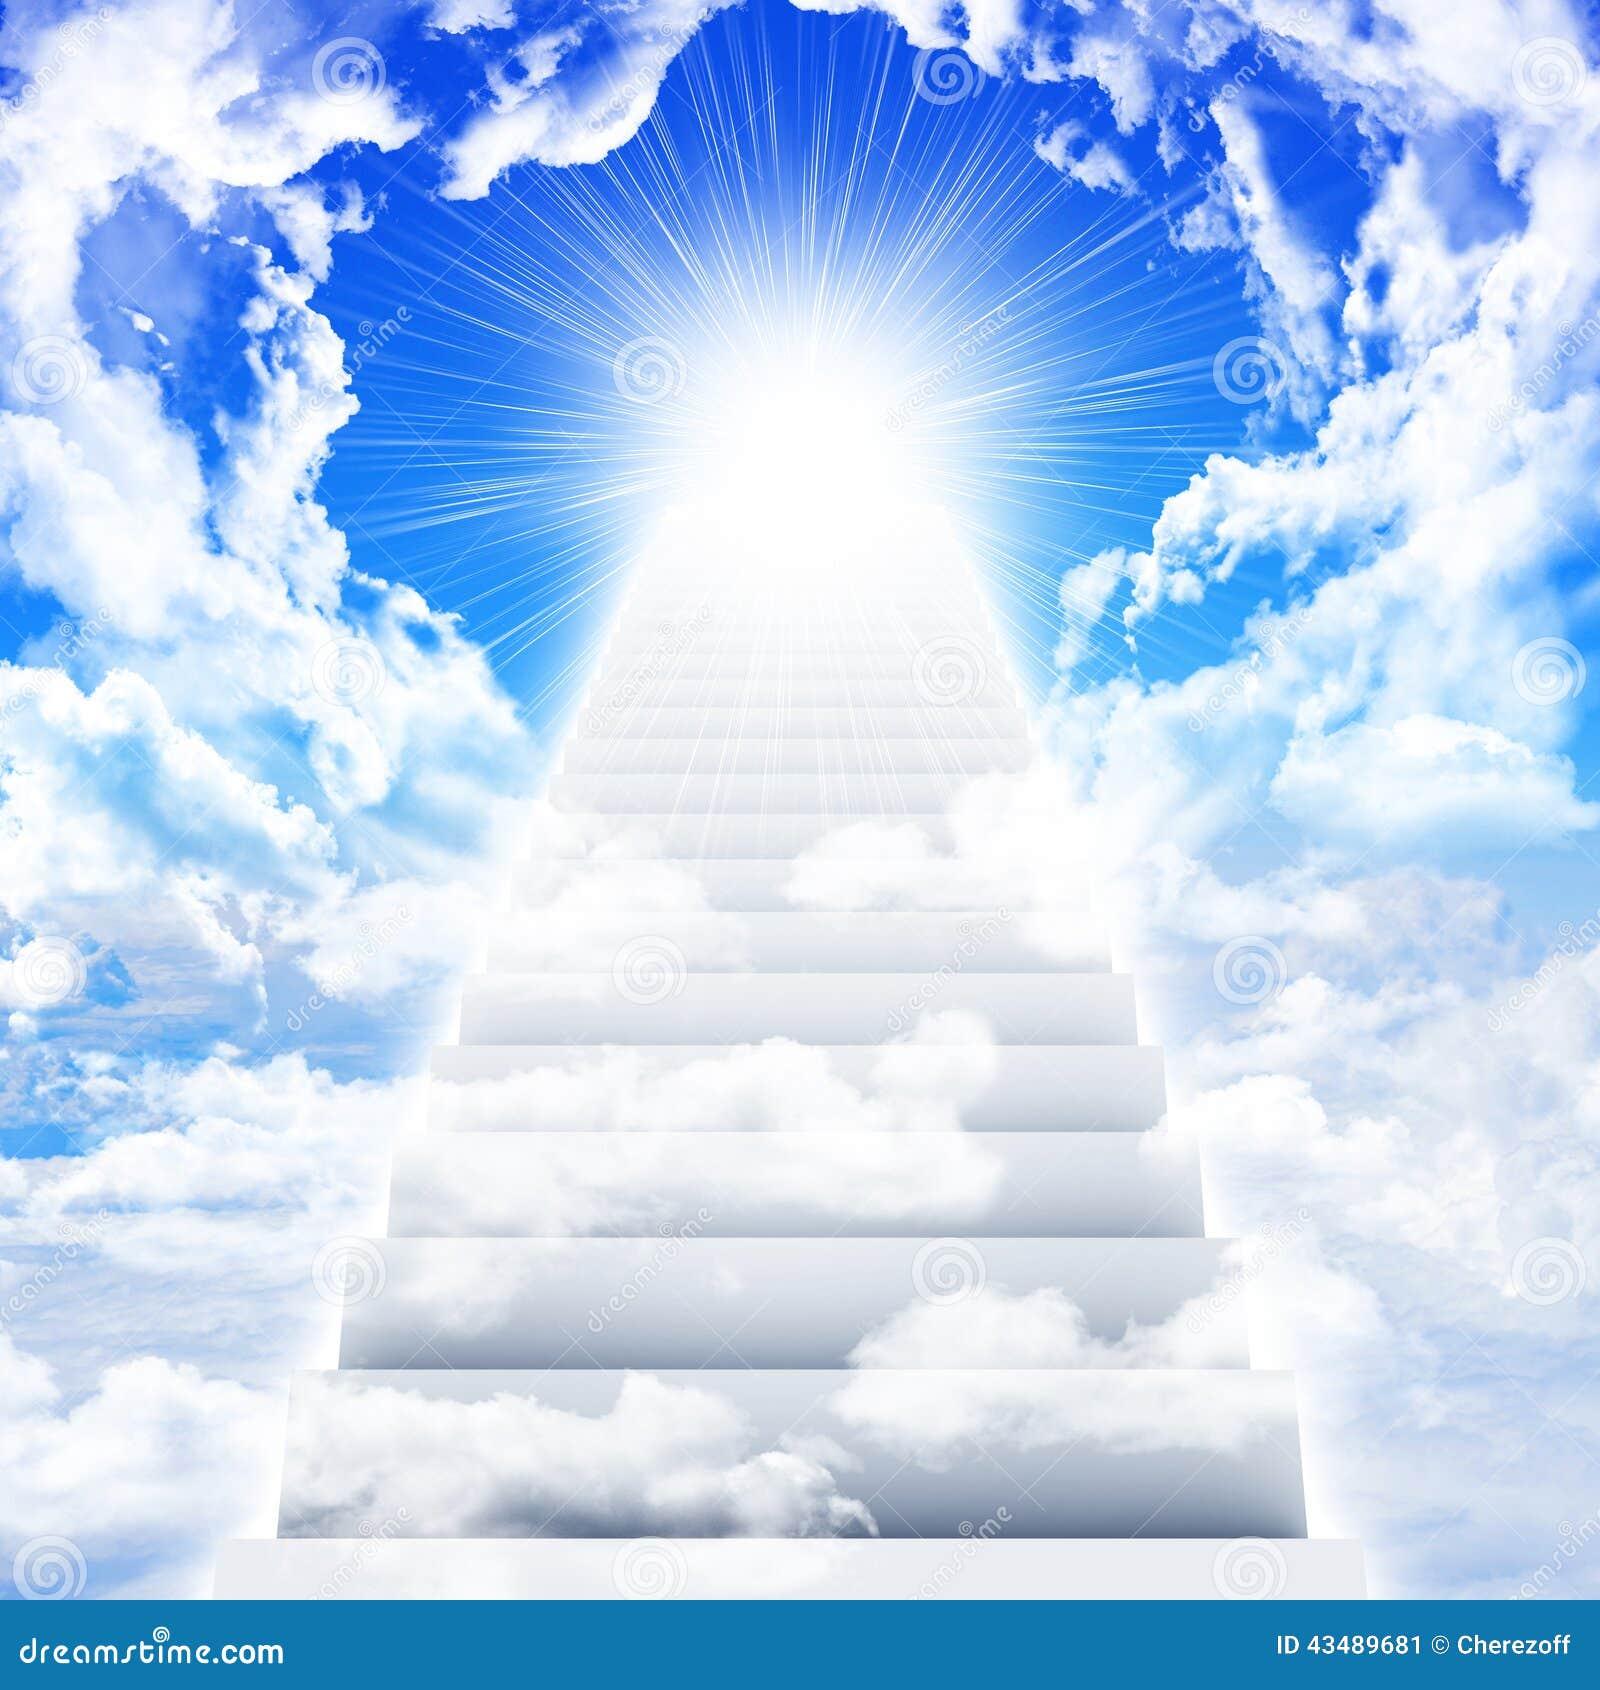 free christian clipart heaven - photo #50